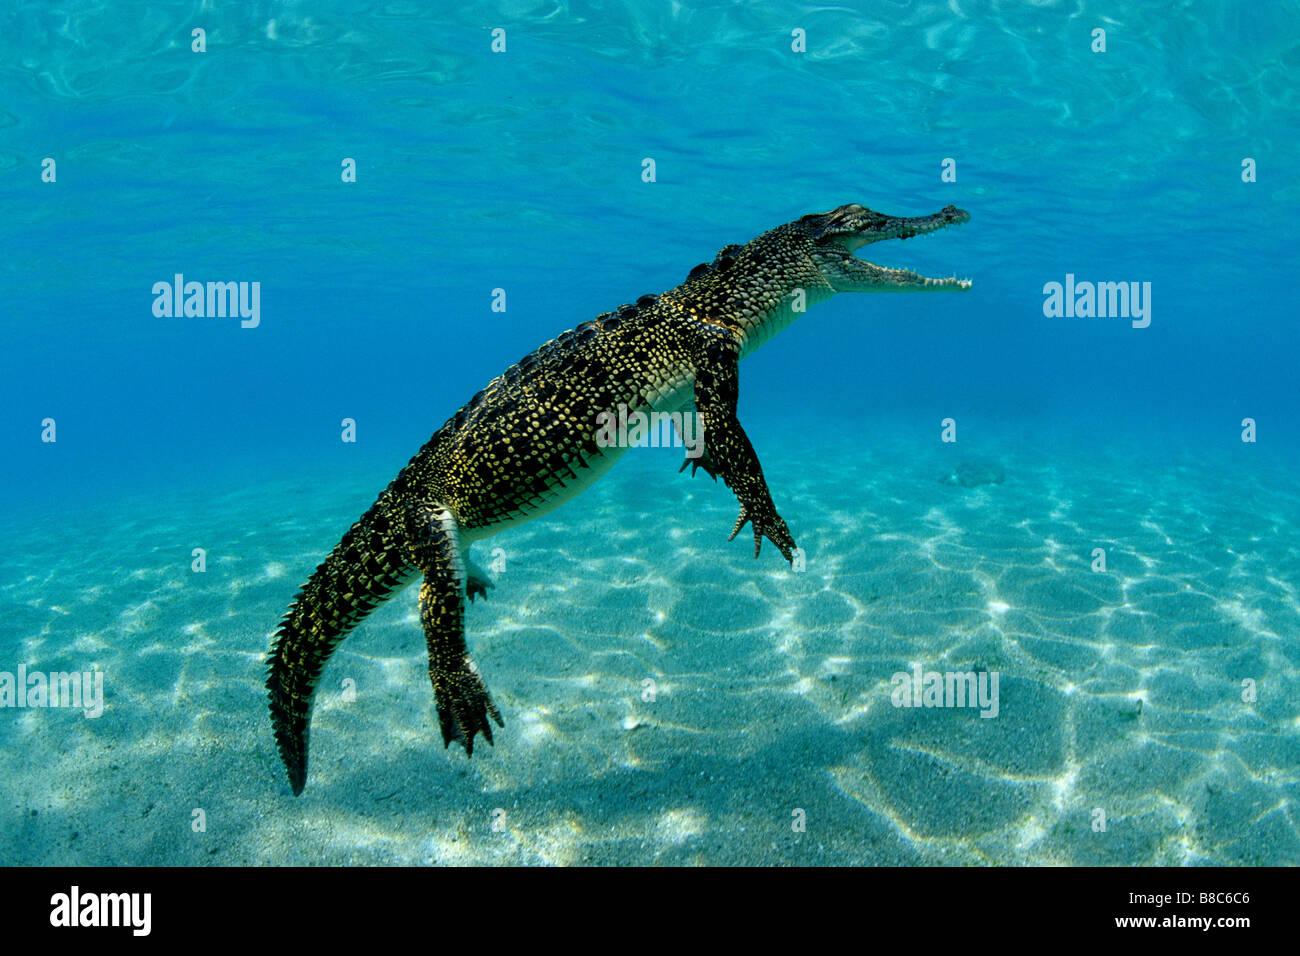 Crocodilo de água salgada Imagens de Stock